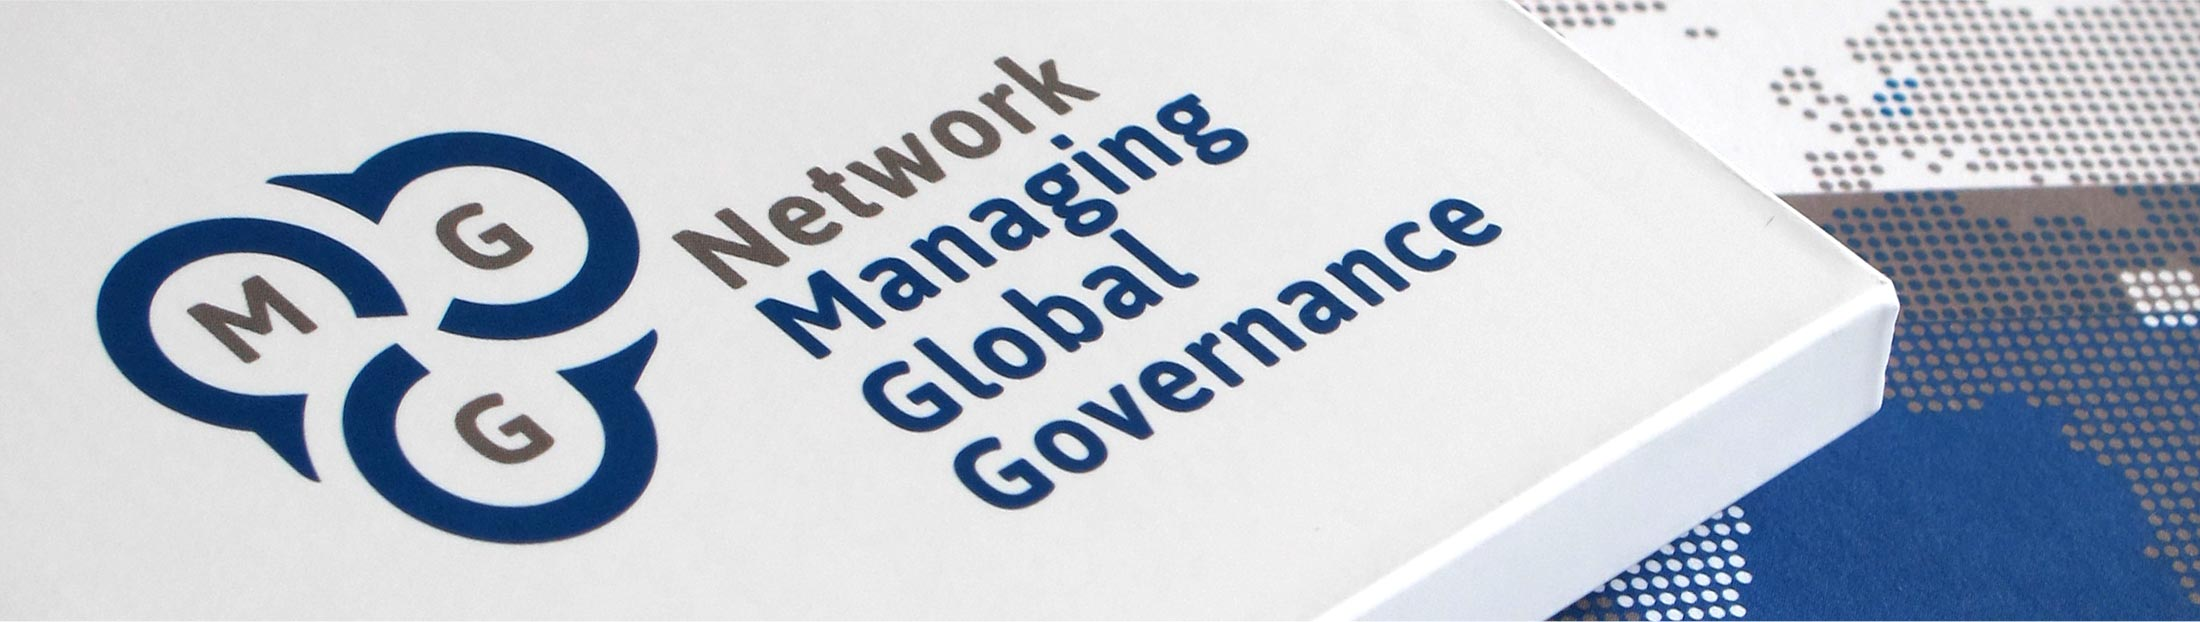 Managing Global Governance